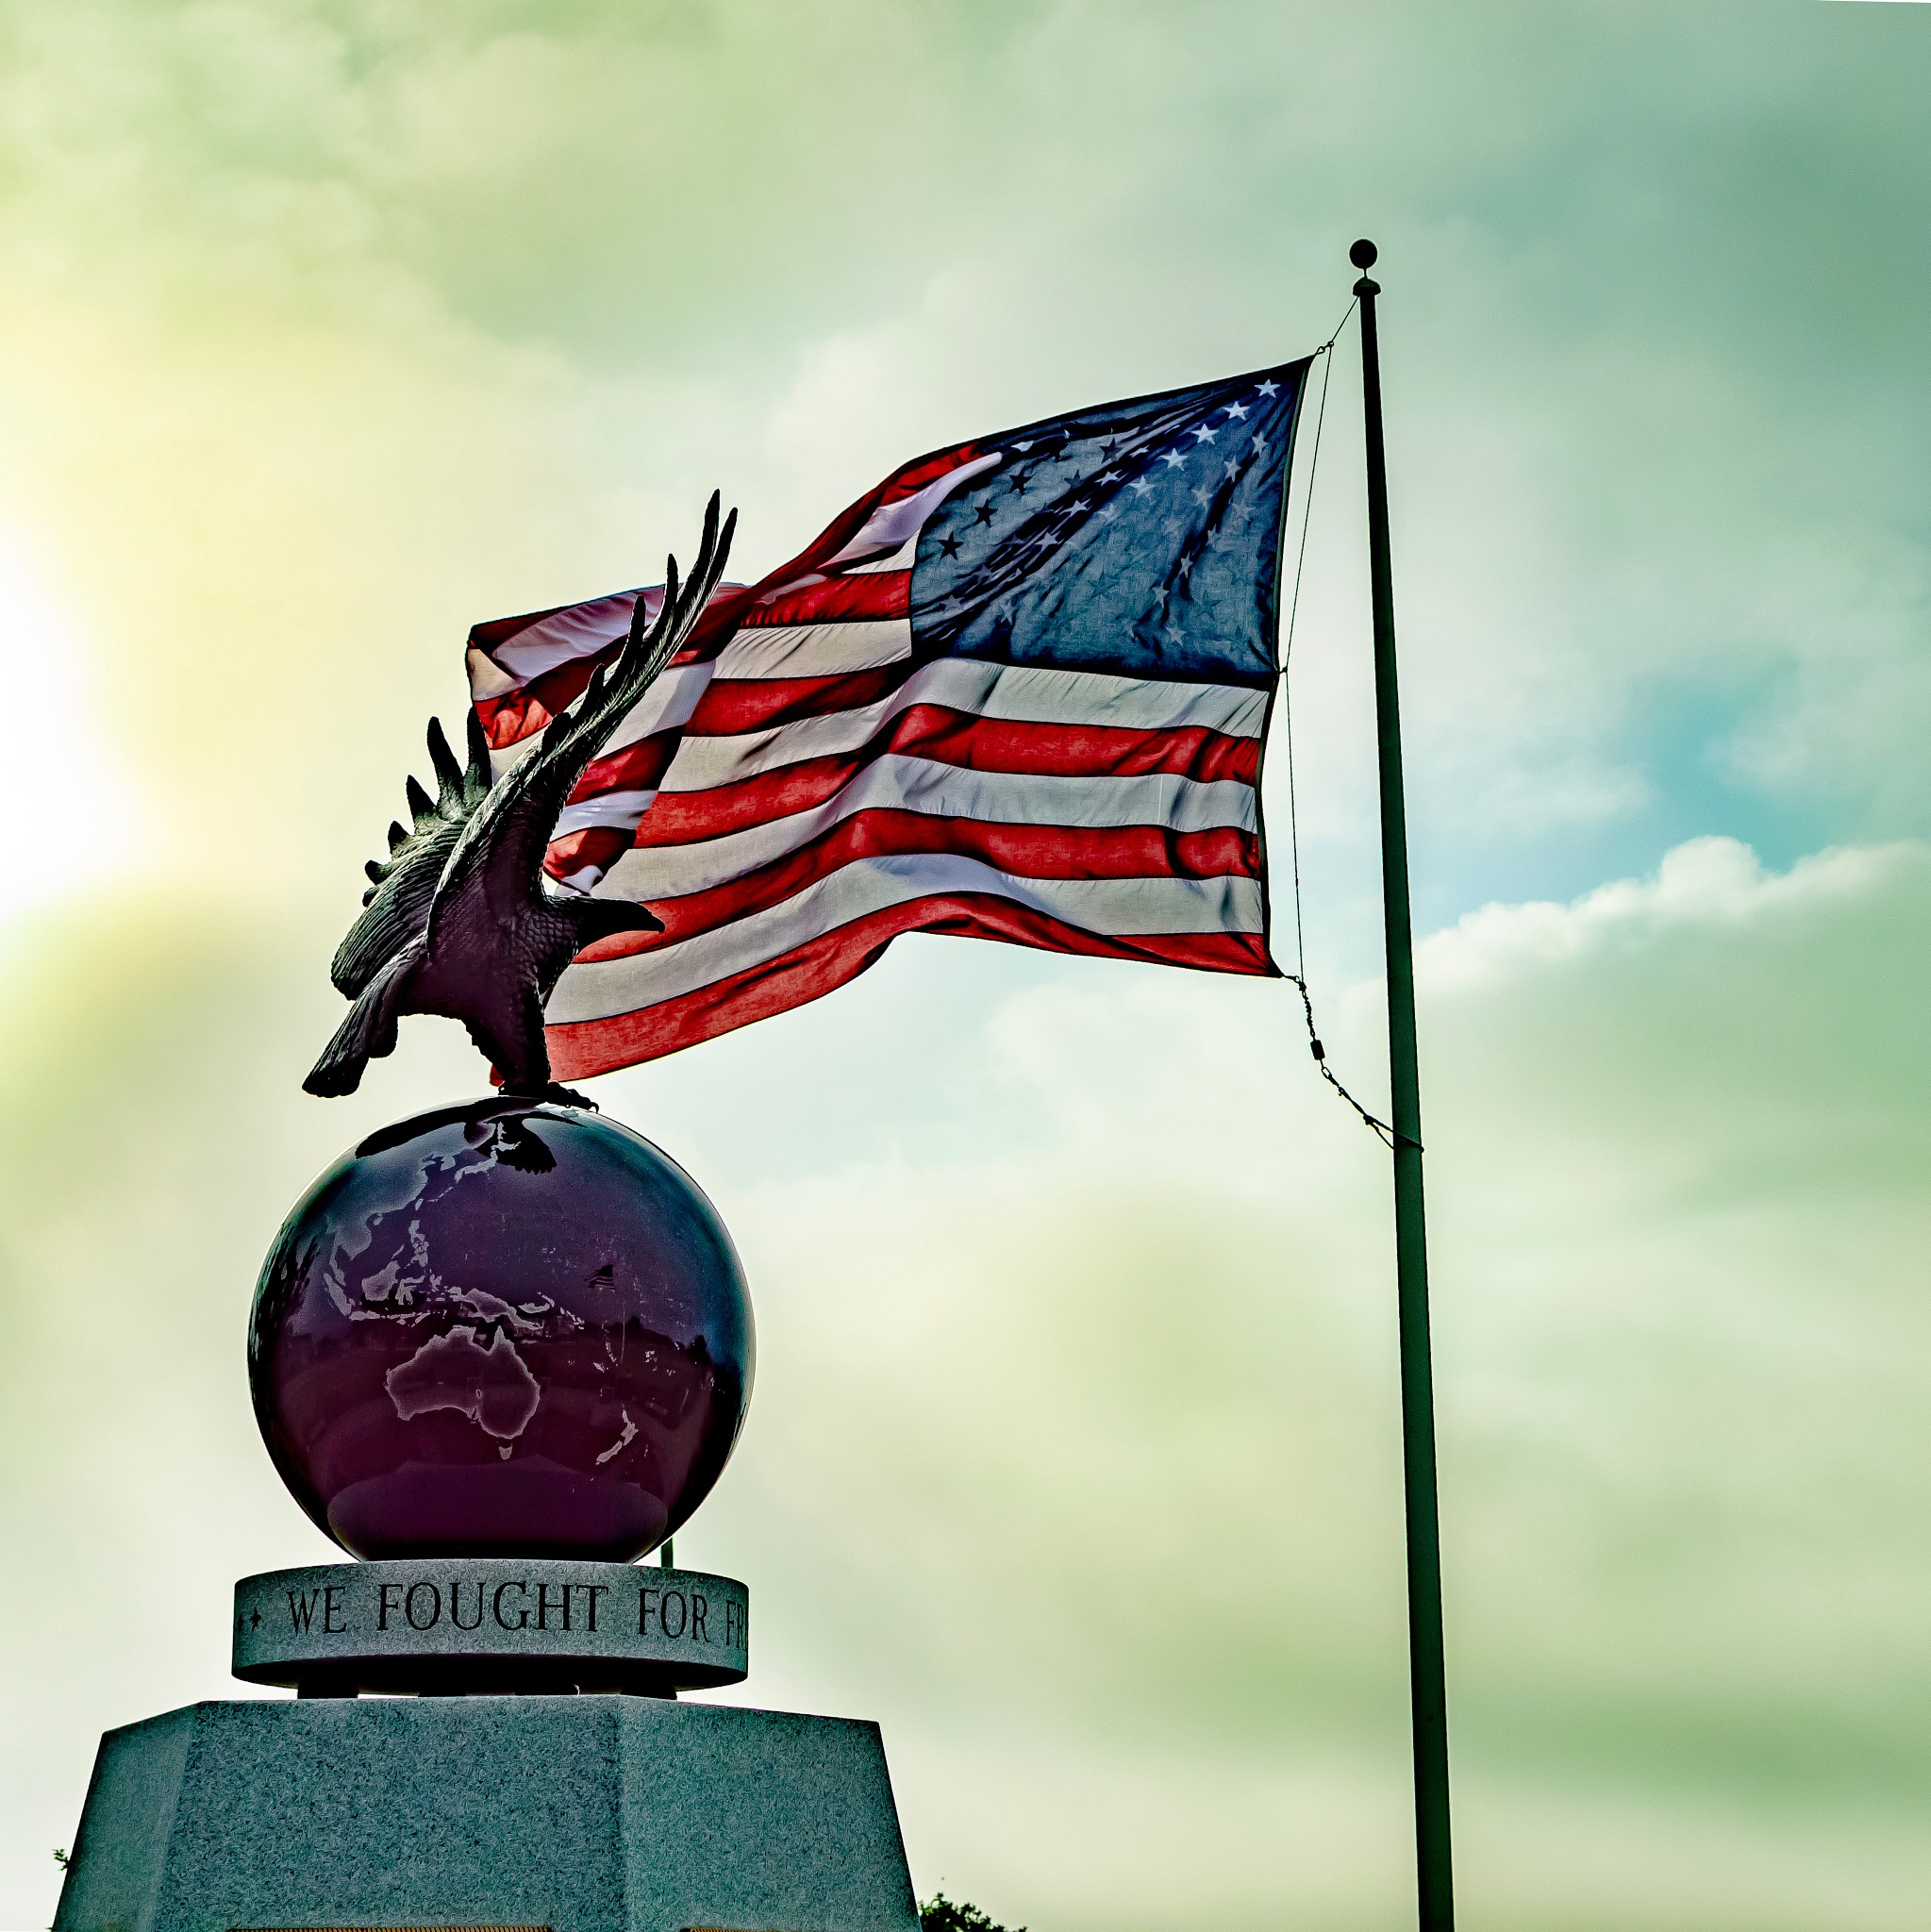 WWII Memorial by Mike Jones